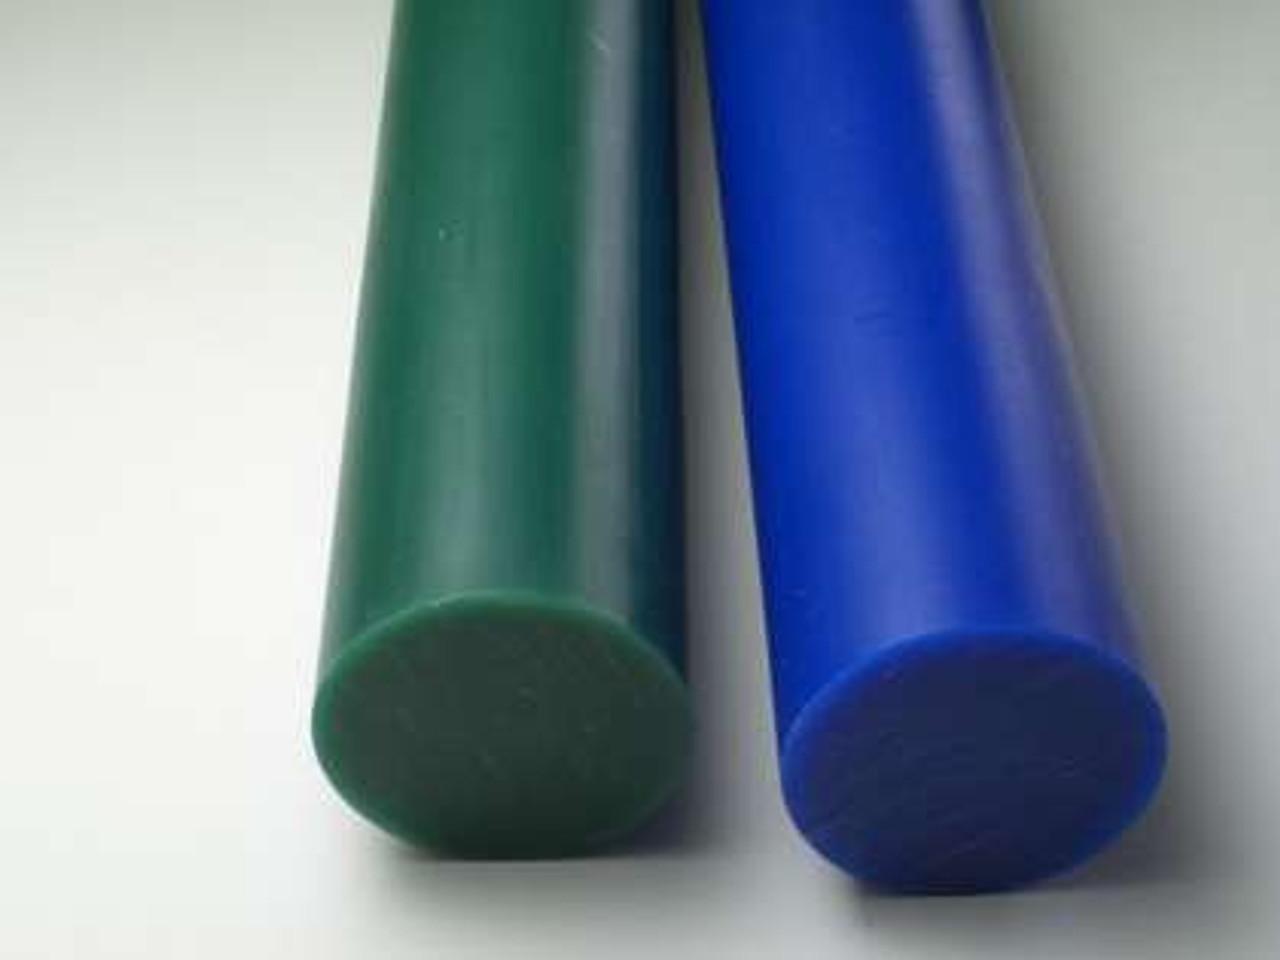 2 inch (49mm) diameter x 12 inch (304mm) long